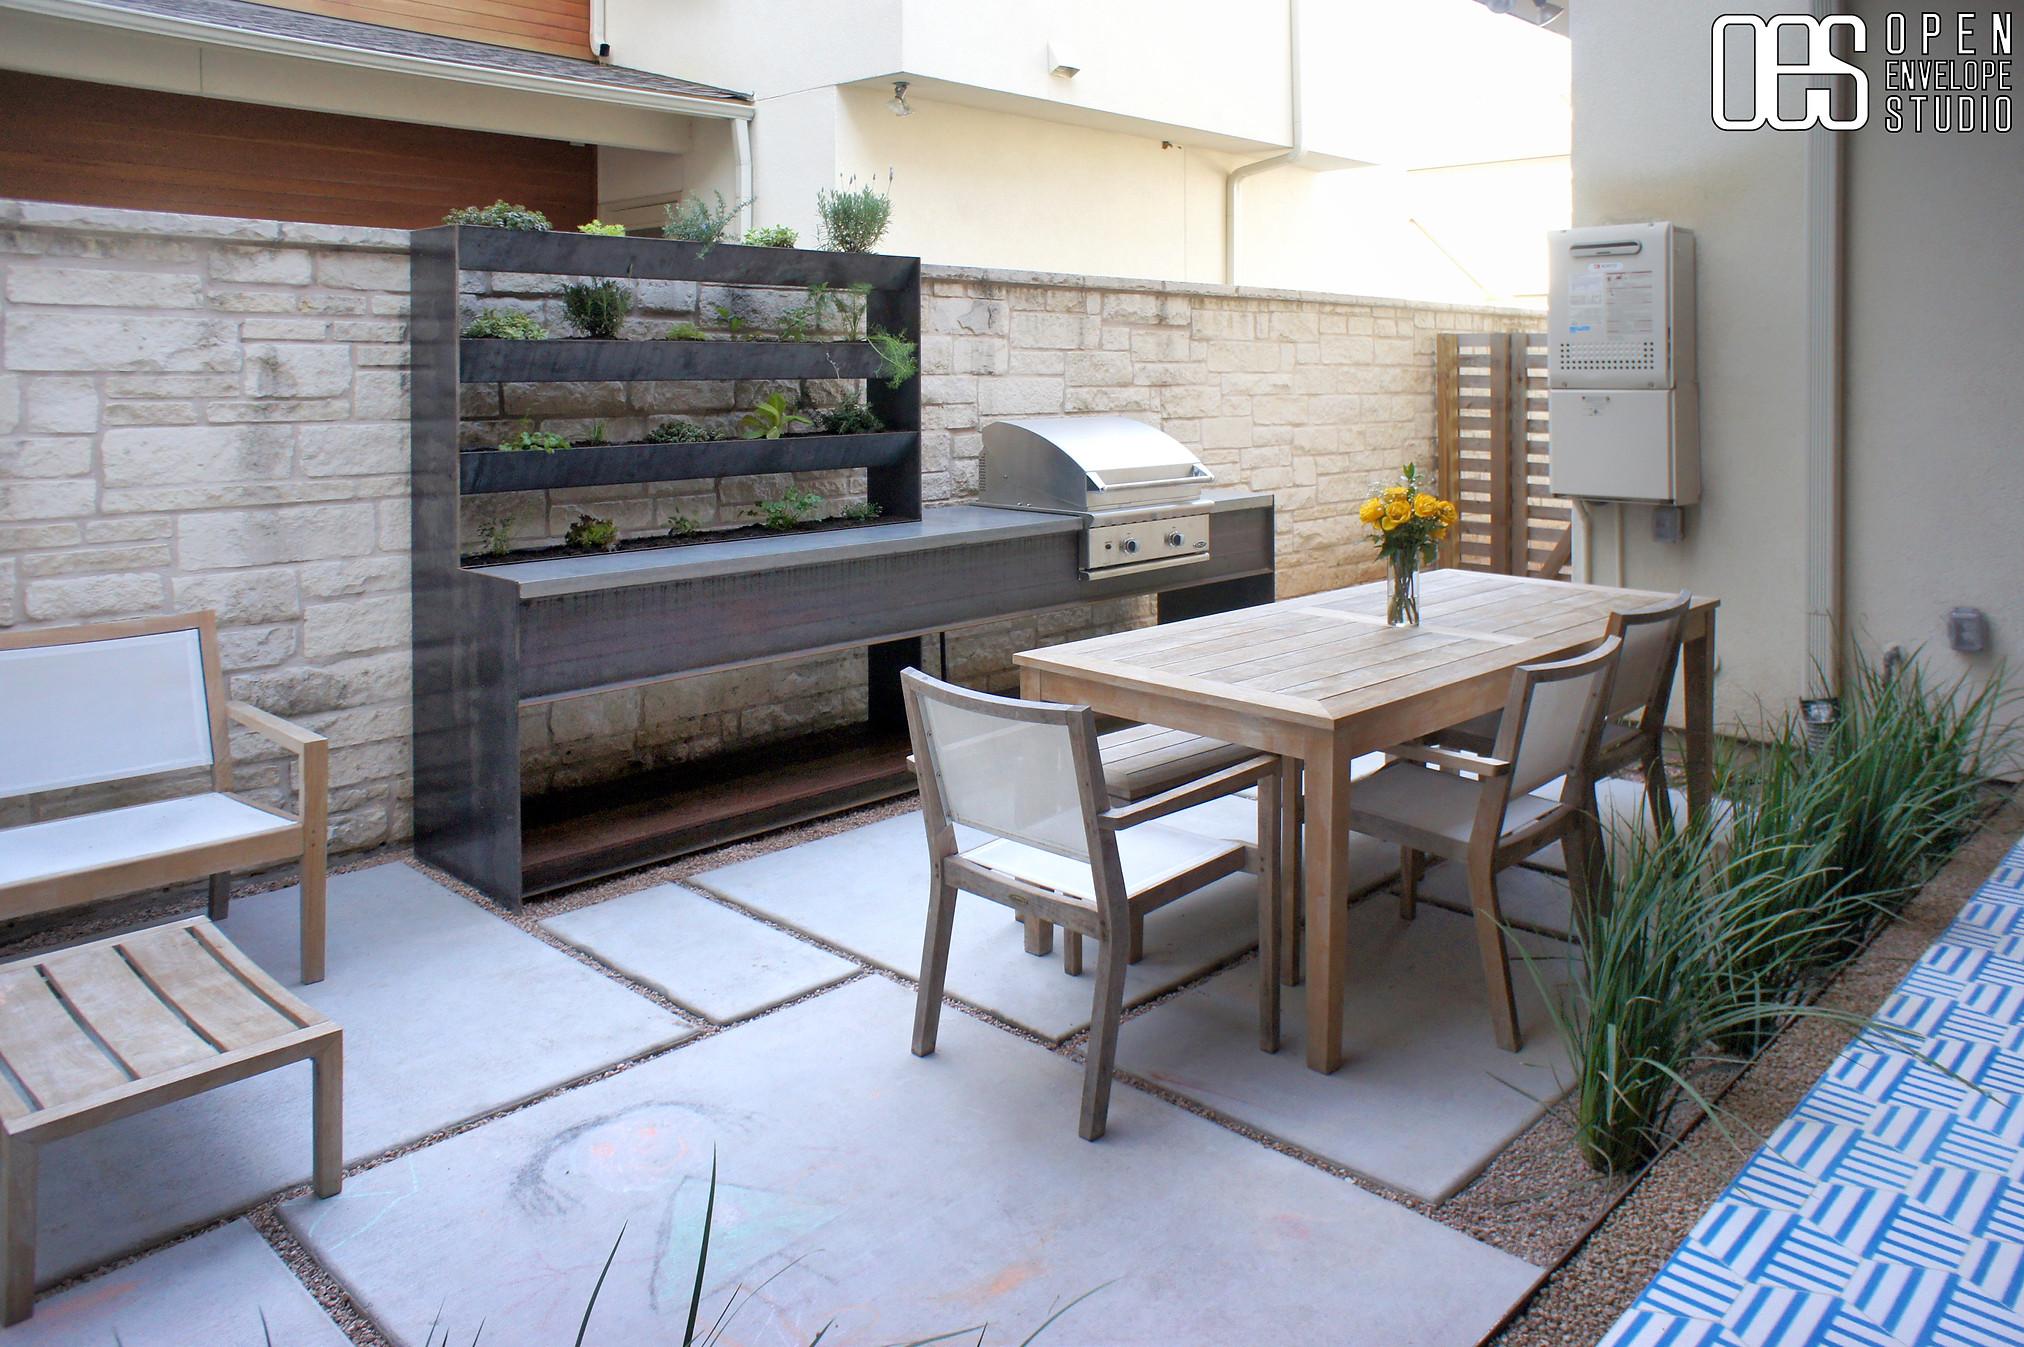 OES | concrete pavers, custom steel grill countertop + credenza planter, pea gravel, and strategic planting